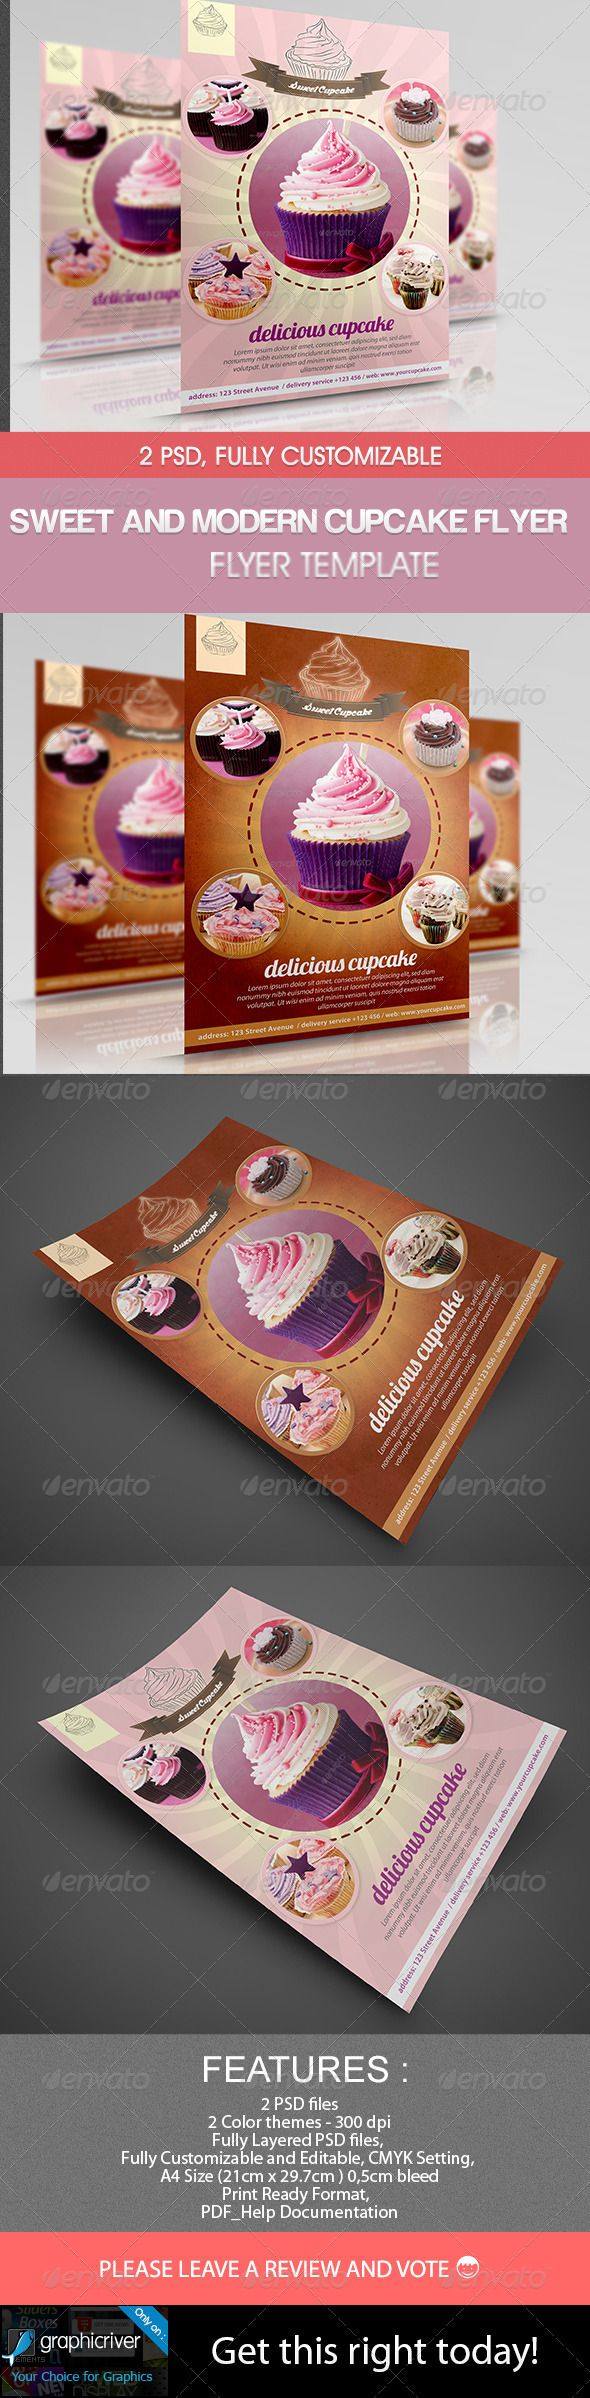 Sweet and Modern Cupcake Flyer - Restaurant Flyers